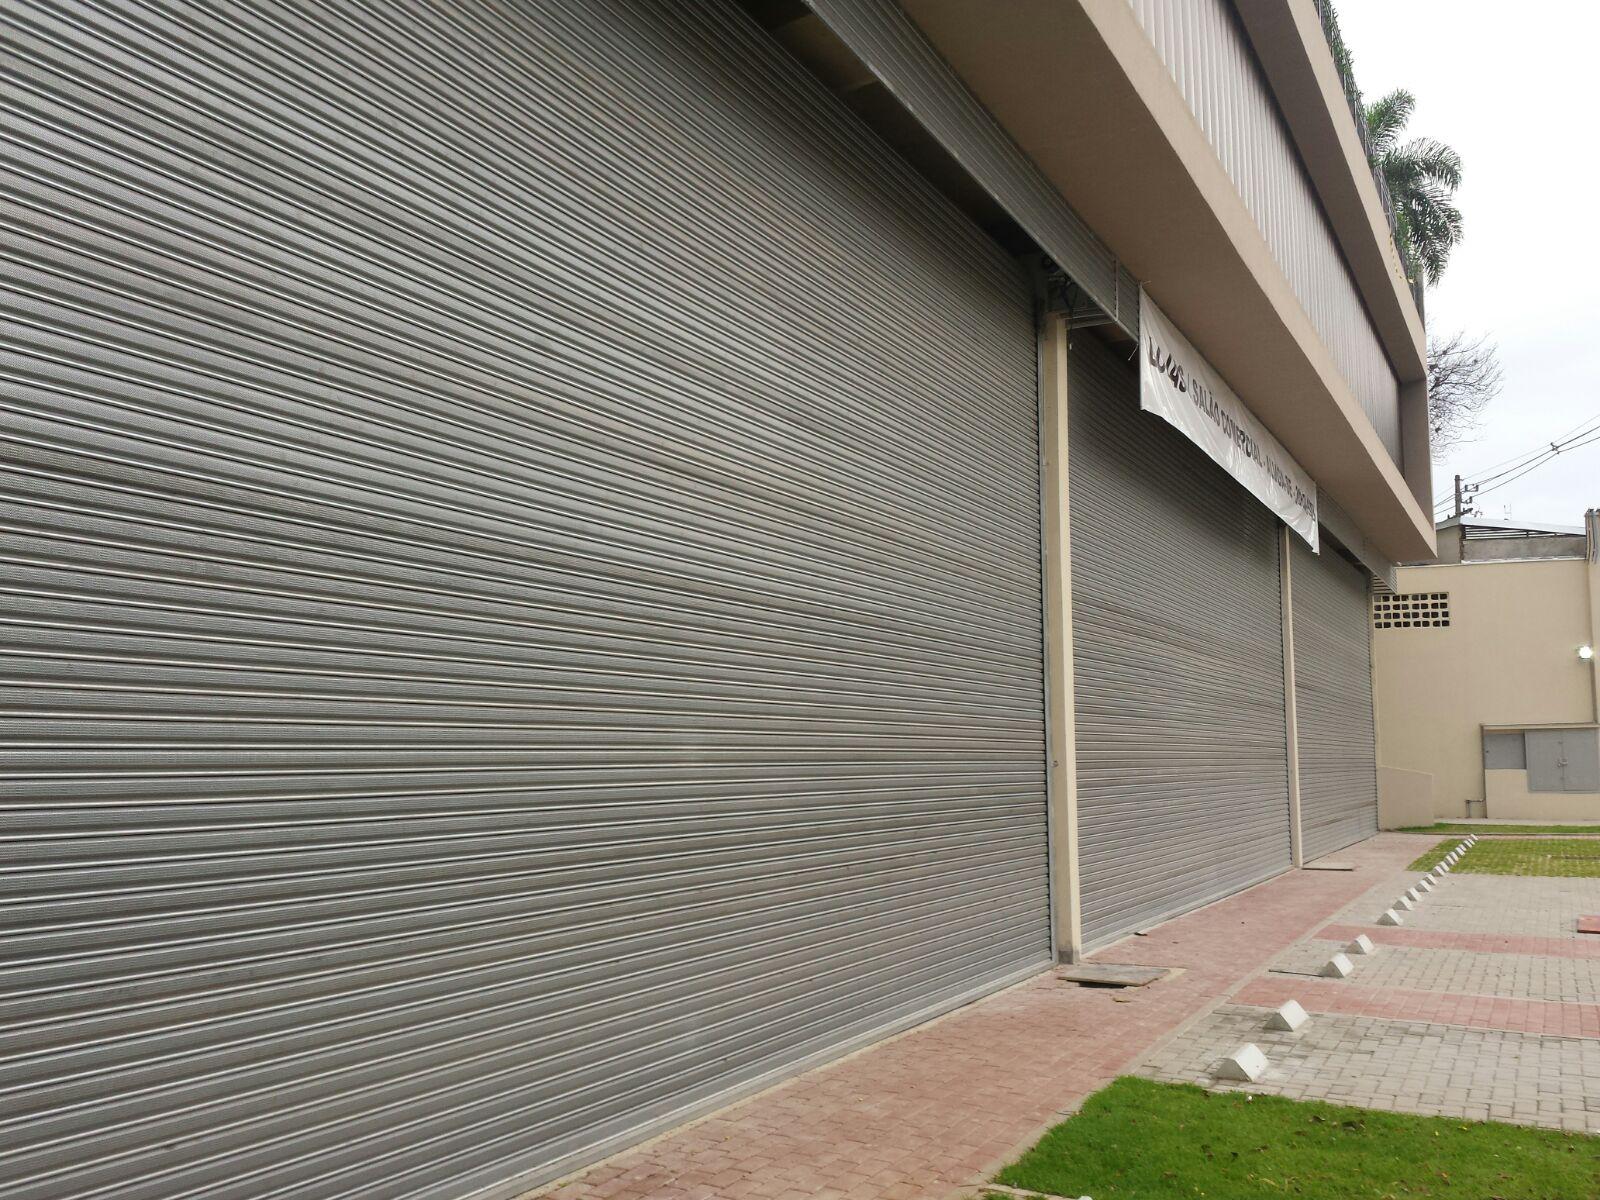 porta de aco de enrolar - SP 99944-2493 Porta Automática de Enrolar